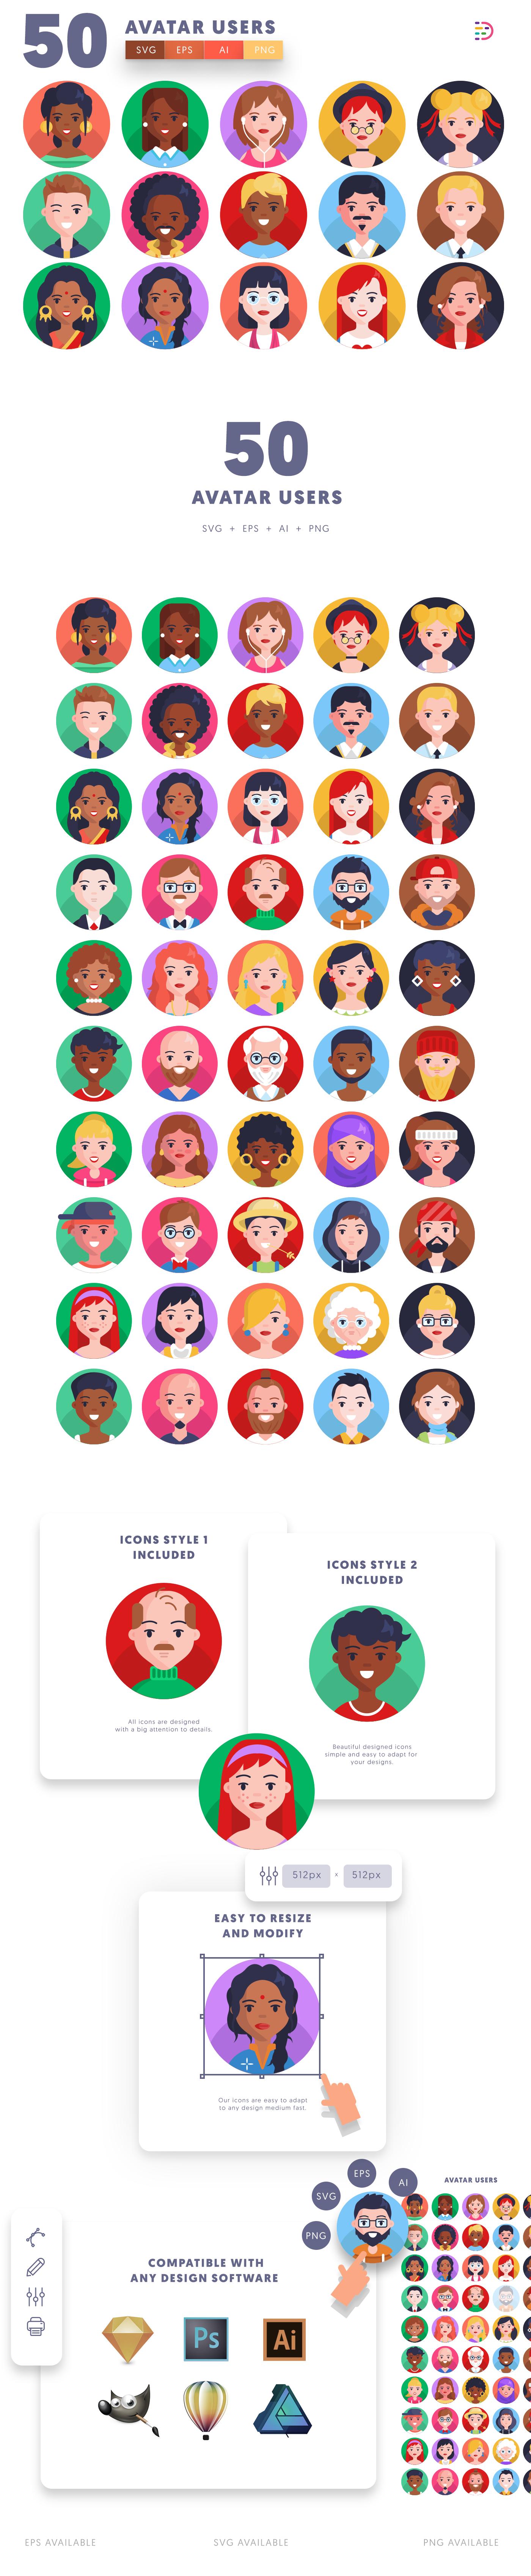 Avatar icons info graphic